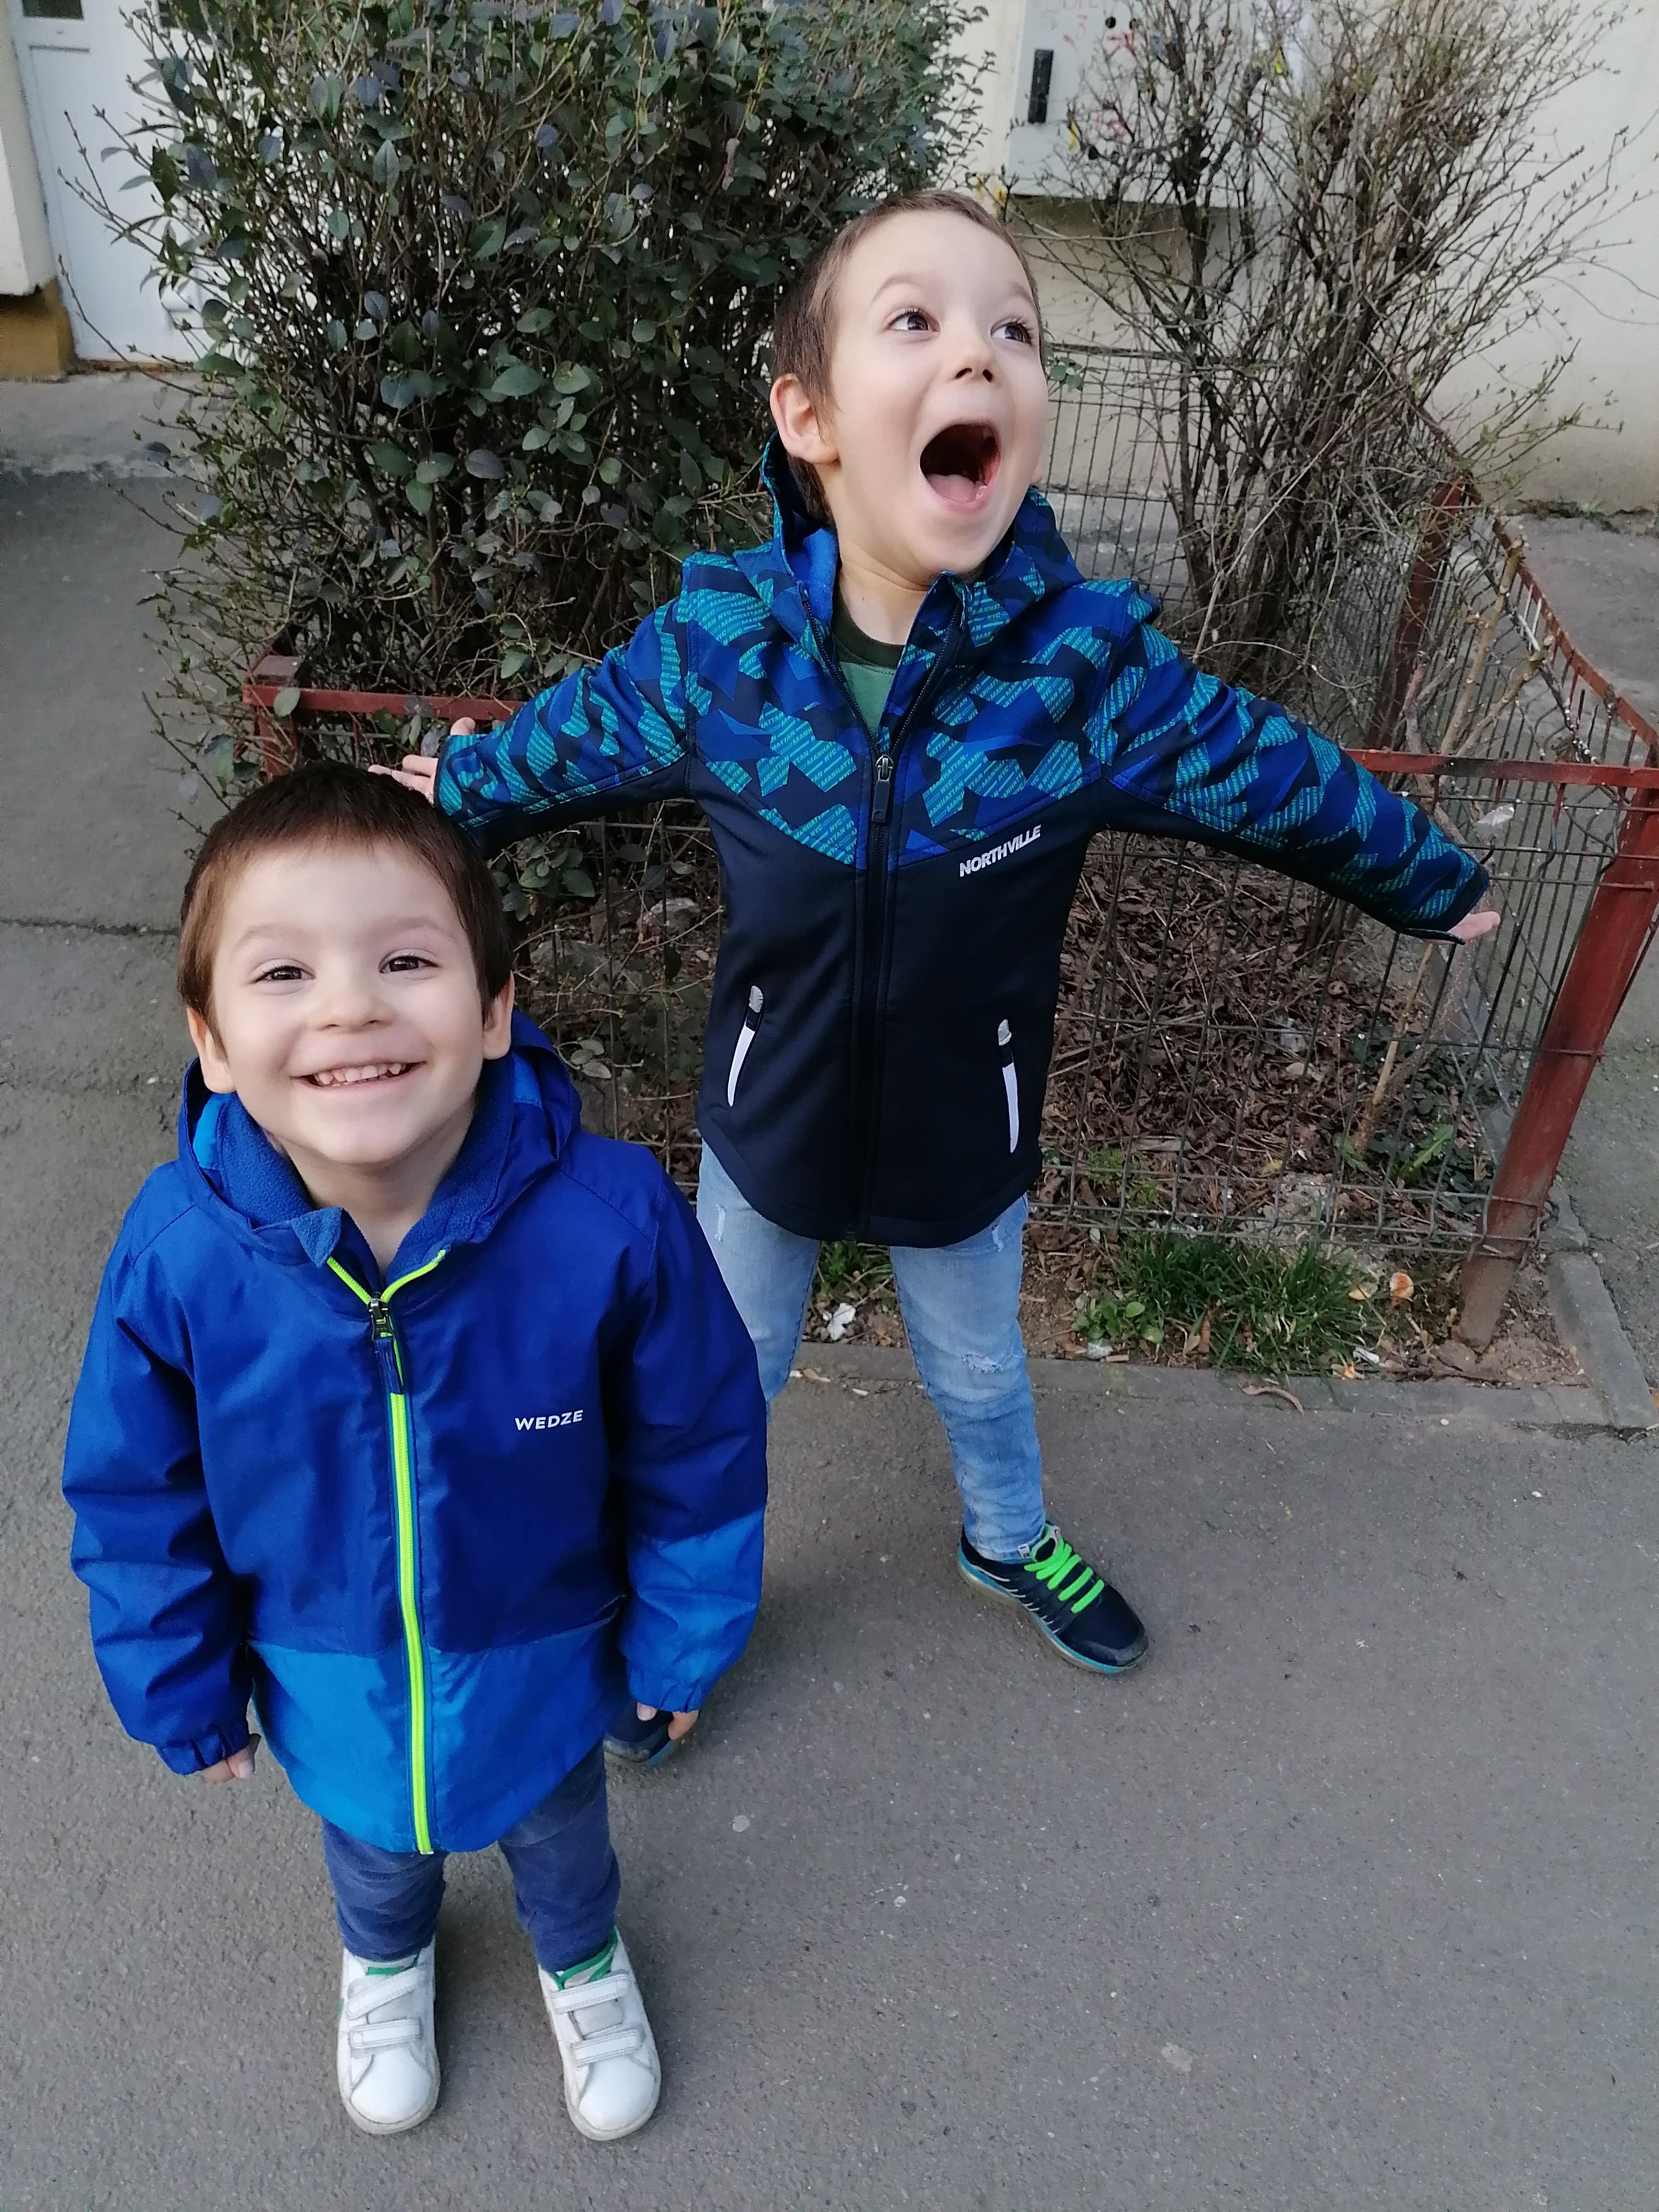 Doi baietei zburdalnici